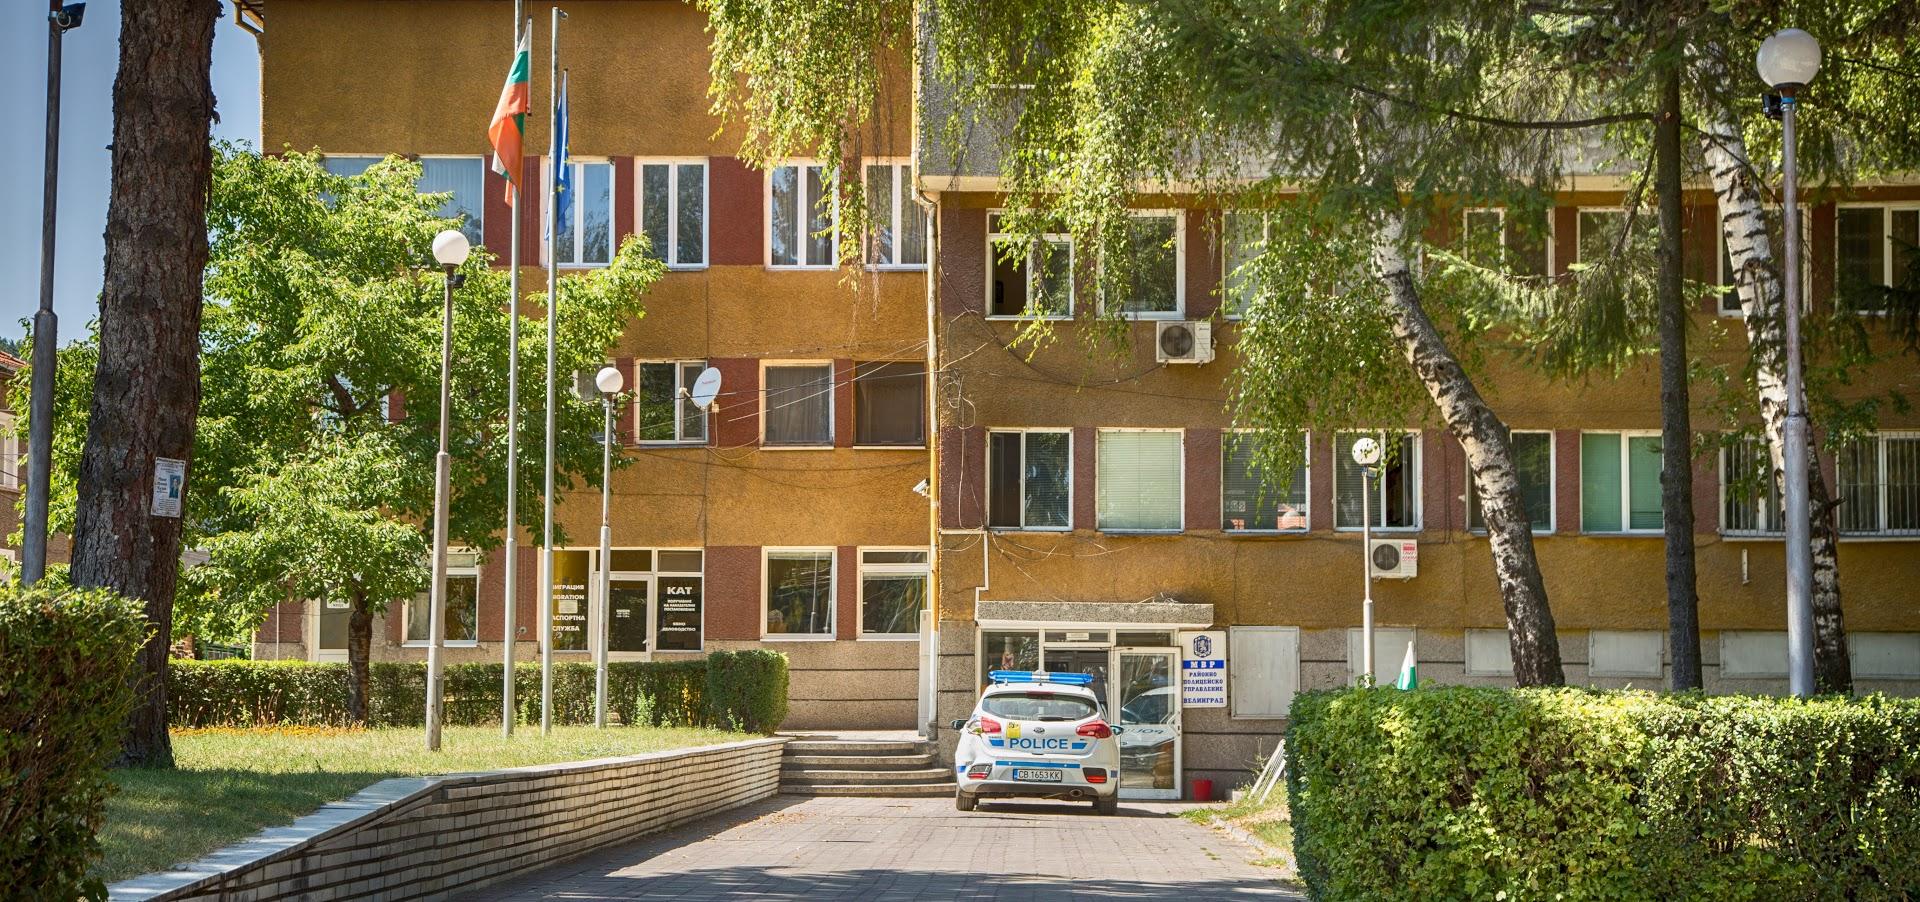 Млад мъж от Велинград стрелял с газов пистолет по свой съгражданин е задържан в ареста на полицейското управление в курорта